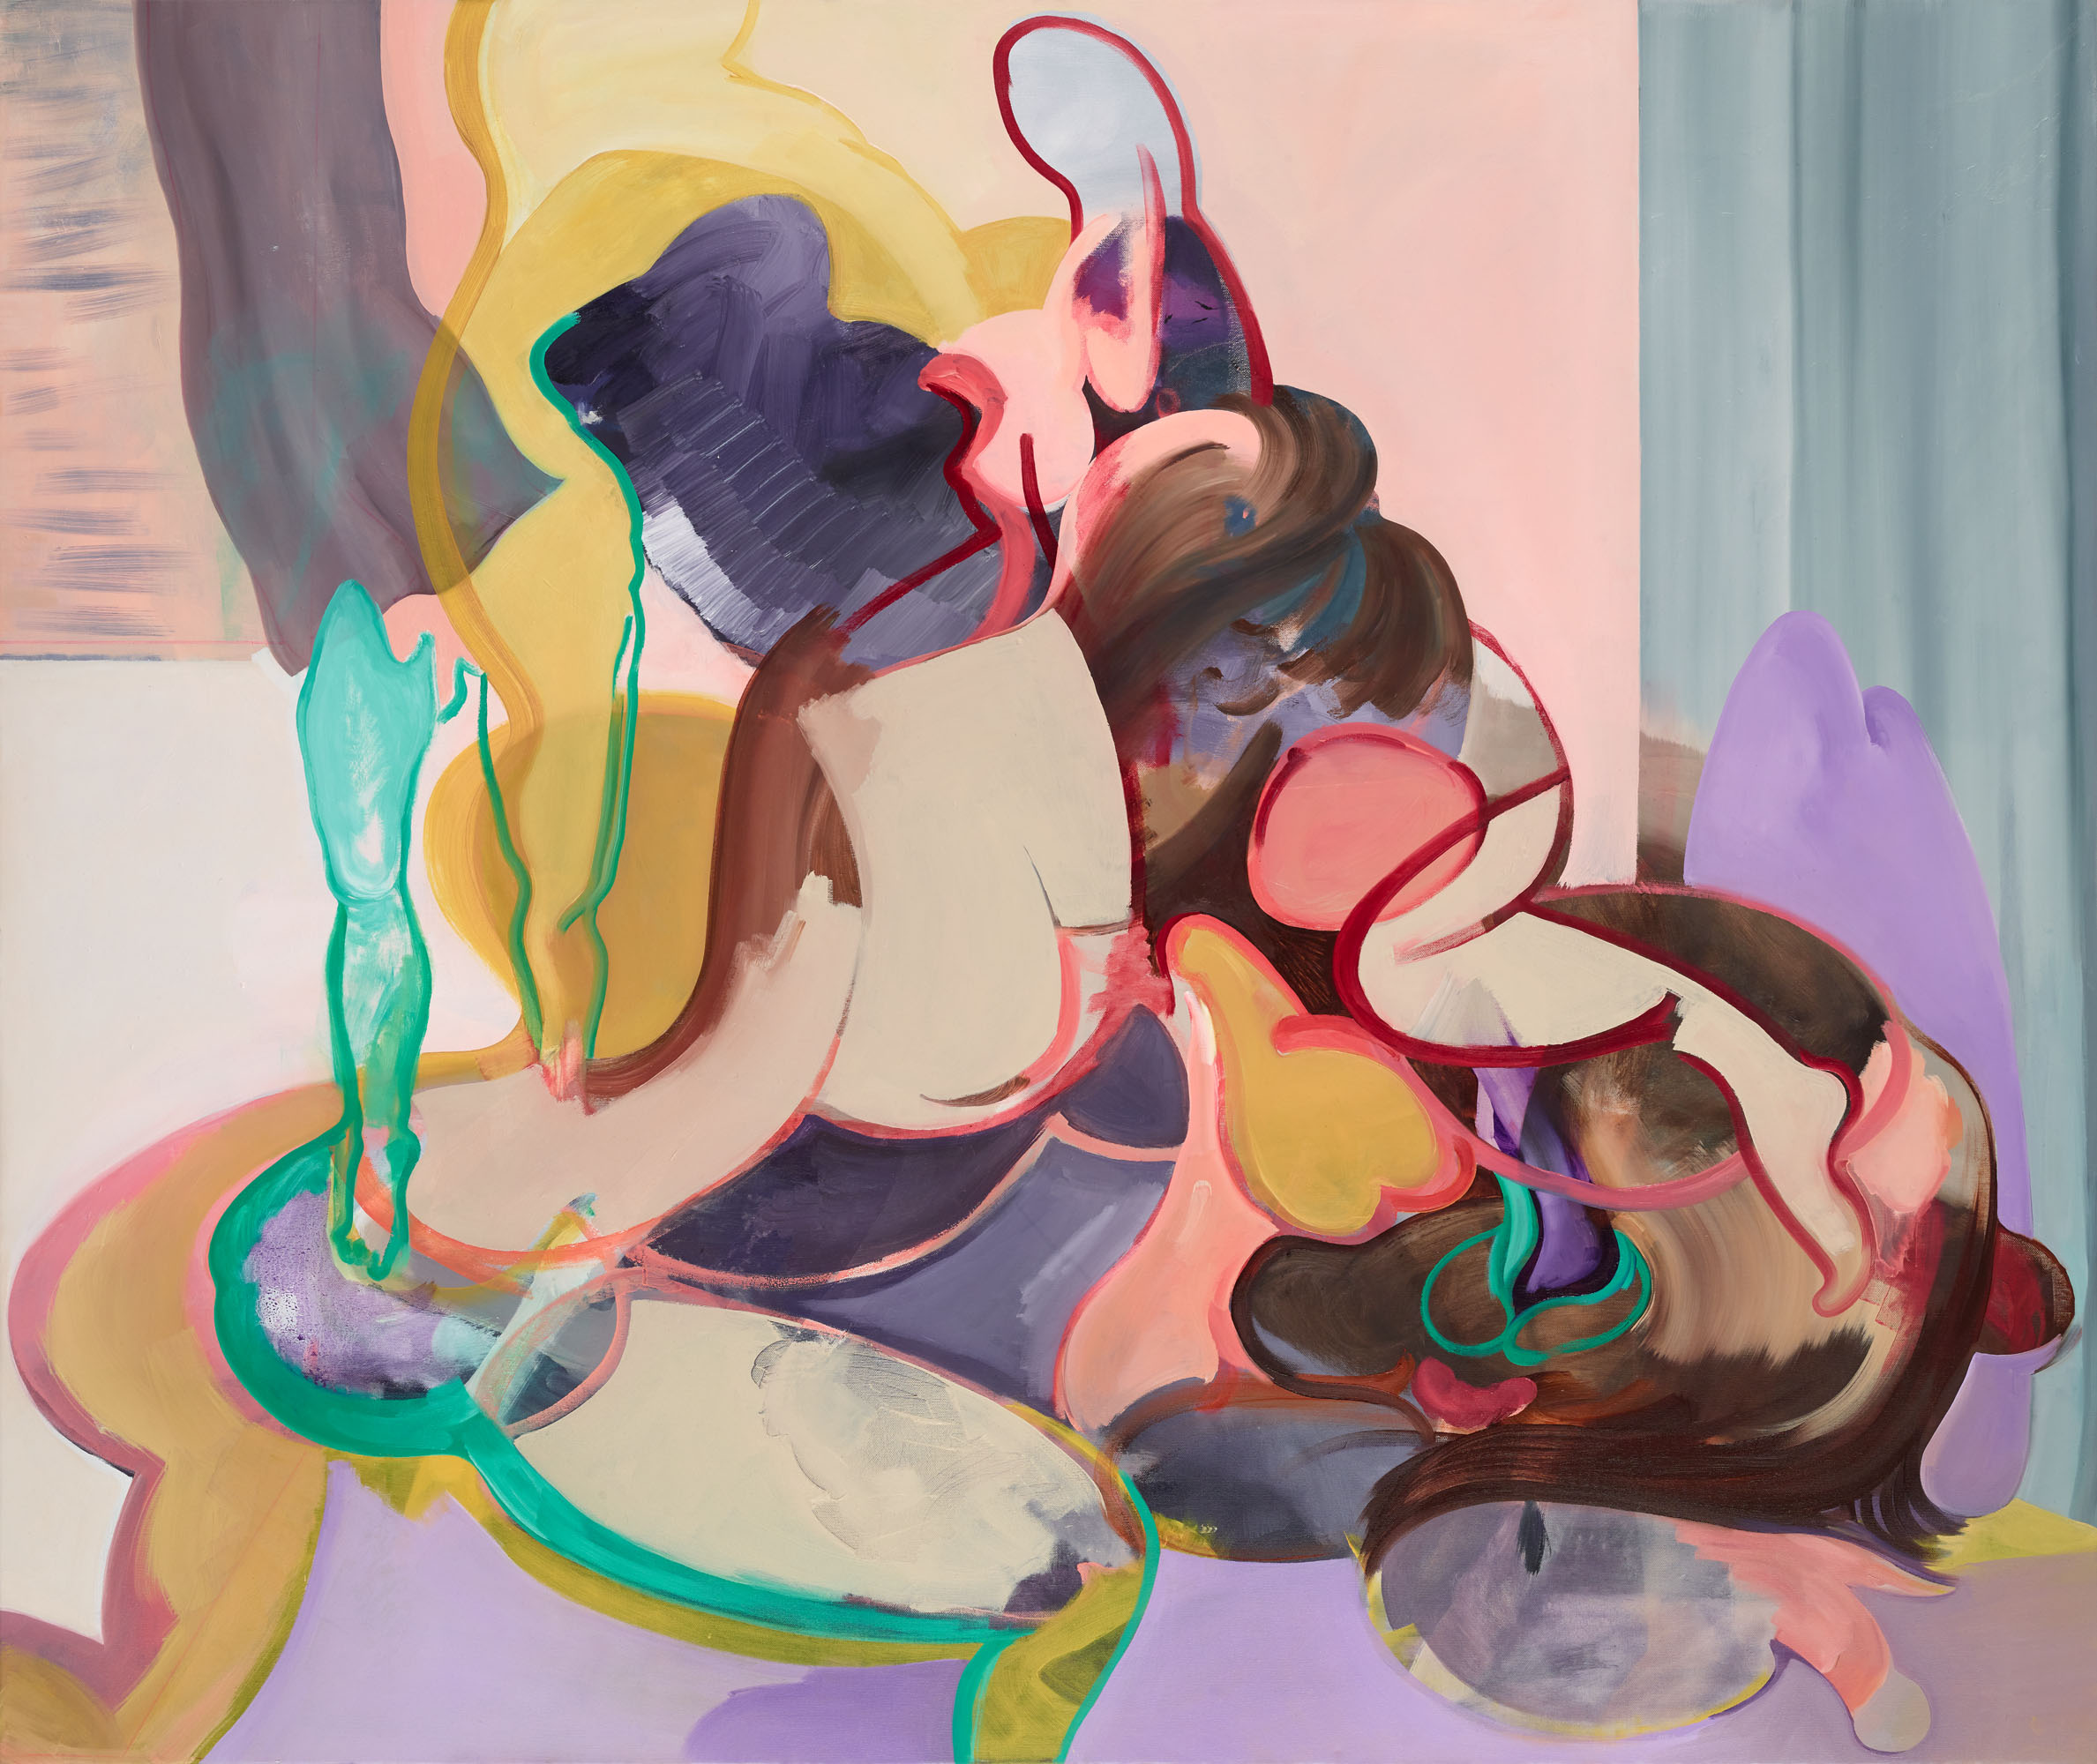 Egle Otto Malerei painting Öl auf Leinwand oil on painting contemporary art contemporary artist Gegenwartskunst Künstlerin female artist female art Oil on canvas body female gaze